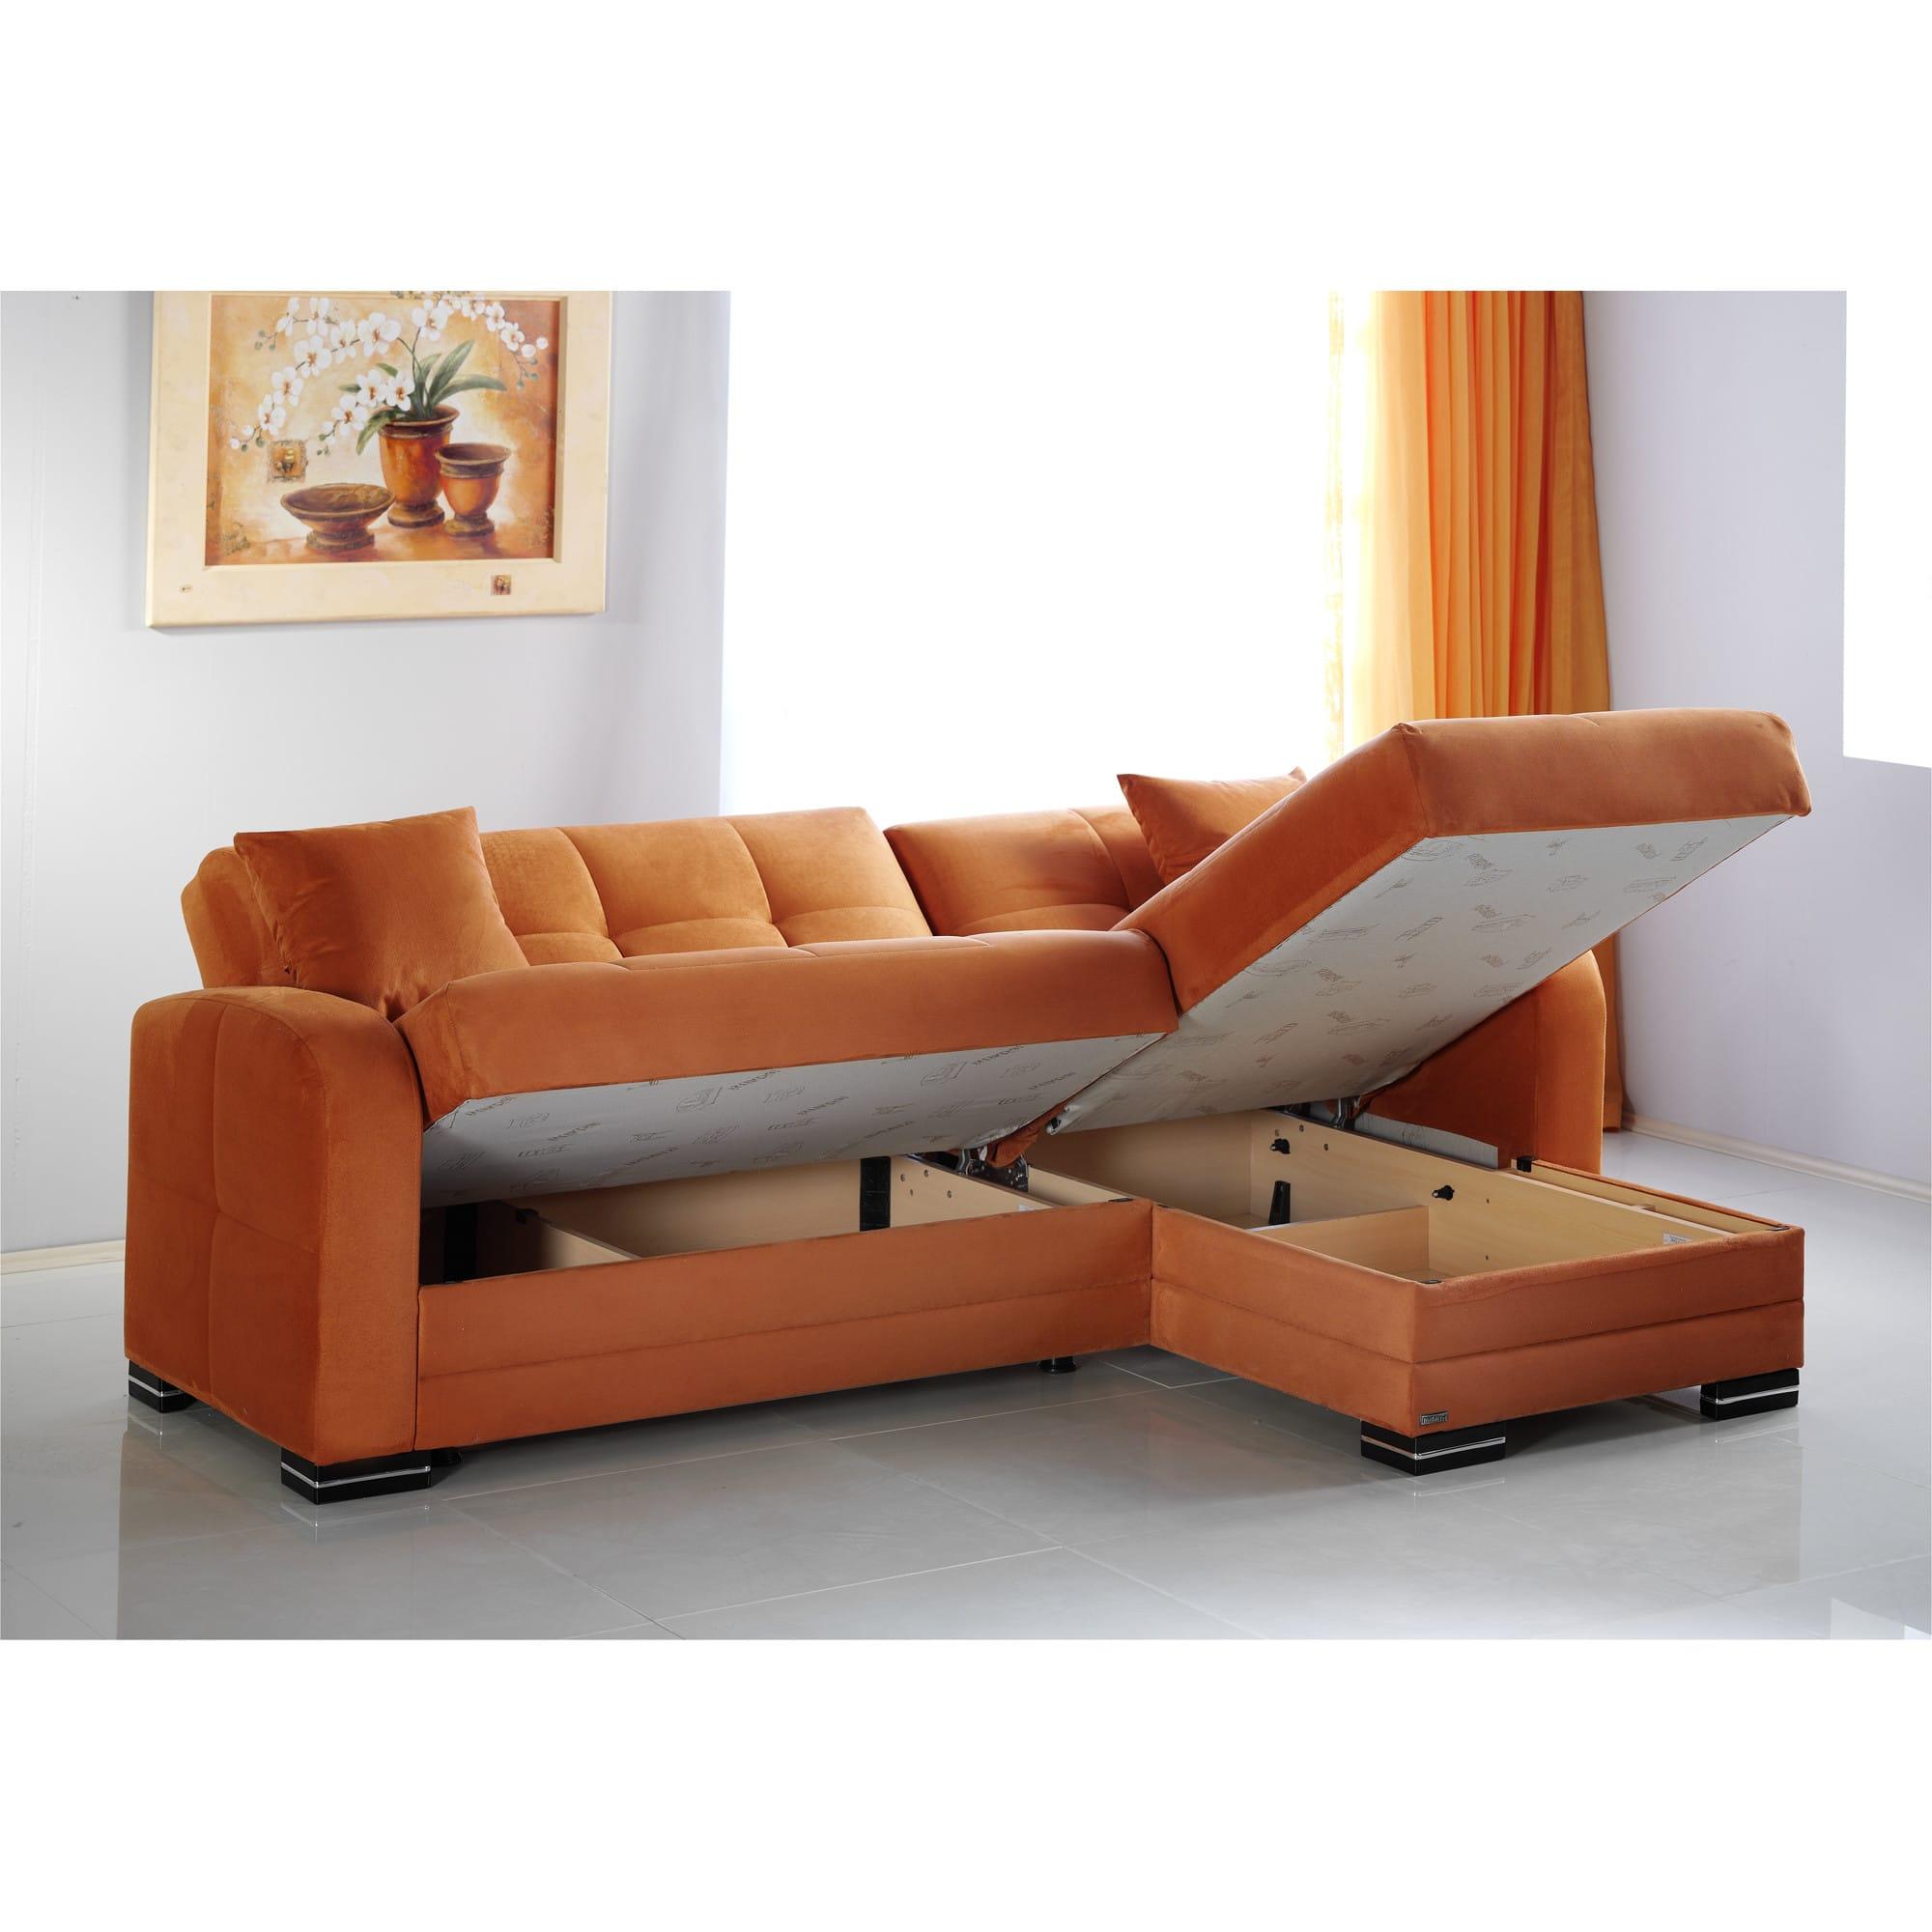 Kubo Rainbow Orange Sectional Sofa By Istikbal Furniture